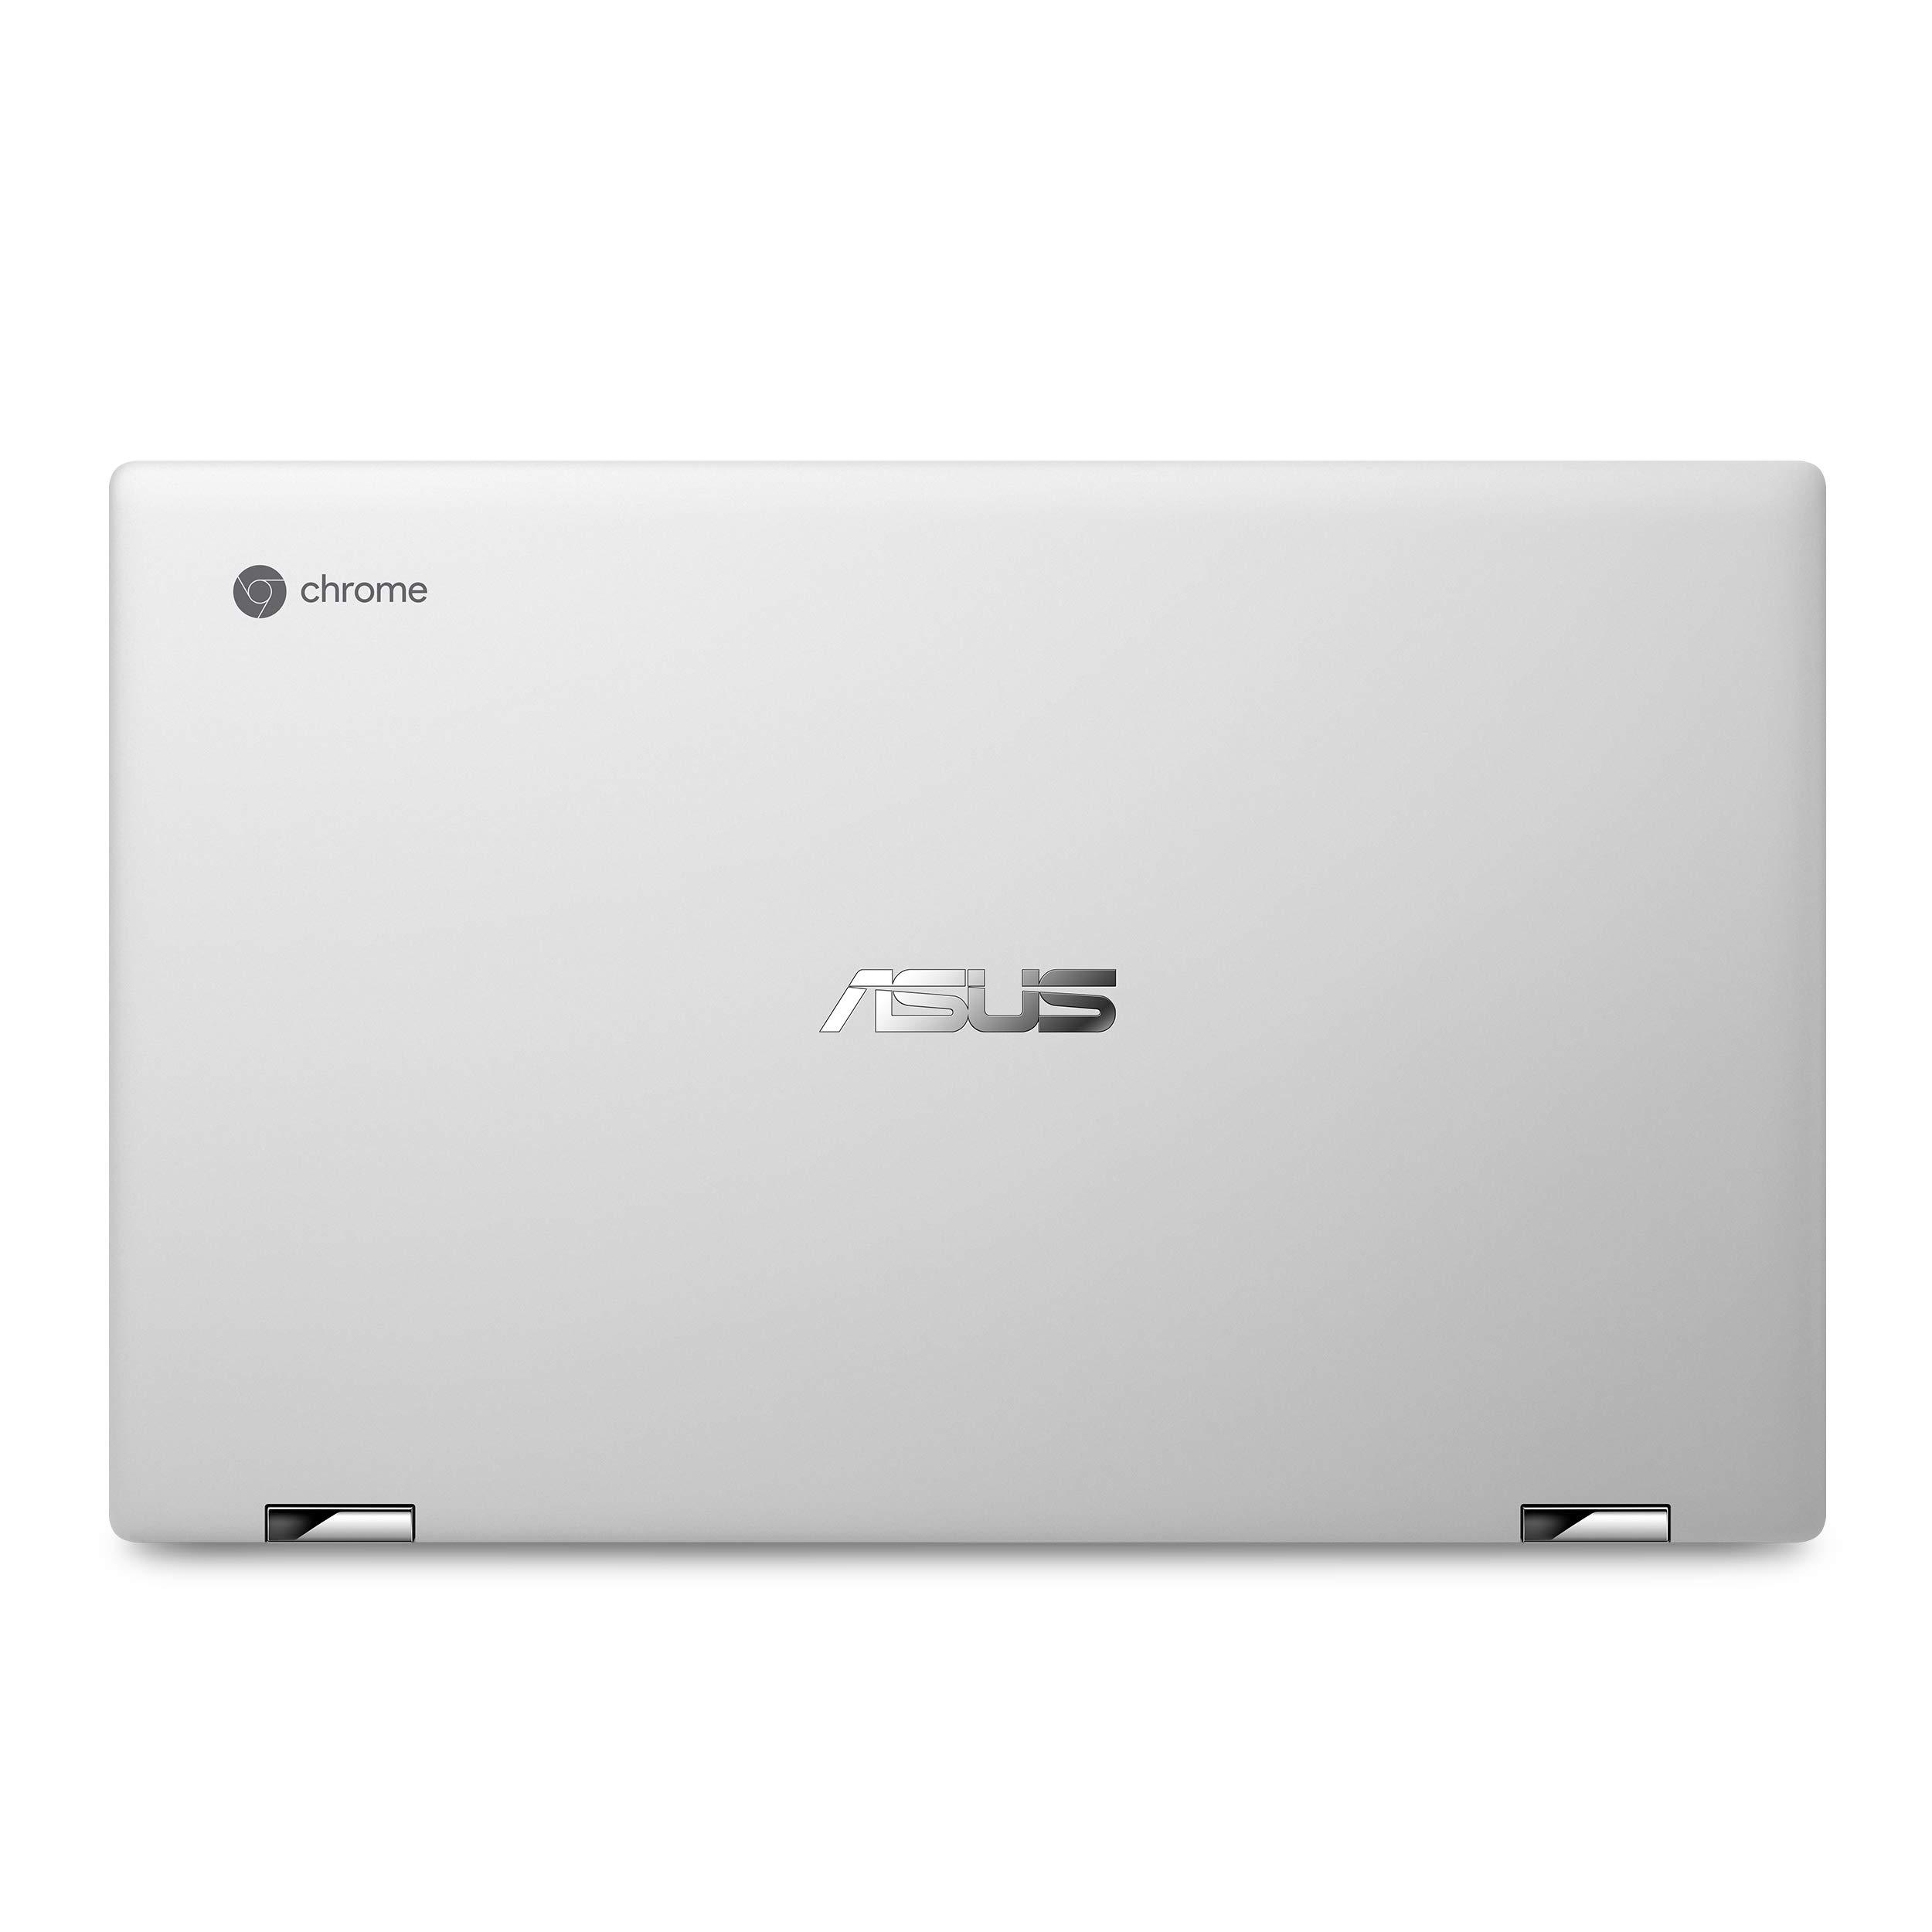 ASUS Chromebook Flip C434TA-DSM4T 2-in-1 Laptop 14'' Touchscreen Full HD 4-Way NanoEdge, Intel Core M3-8100Y Processor, 4GB RAM, 64GB eMMC Storage, Chrome OS by ASUS (Image #3)